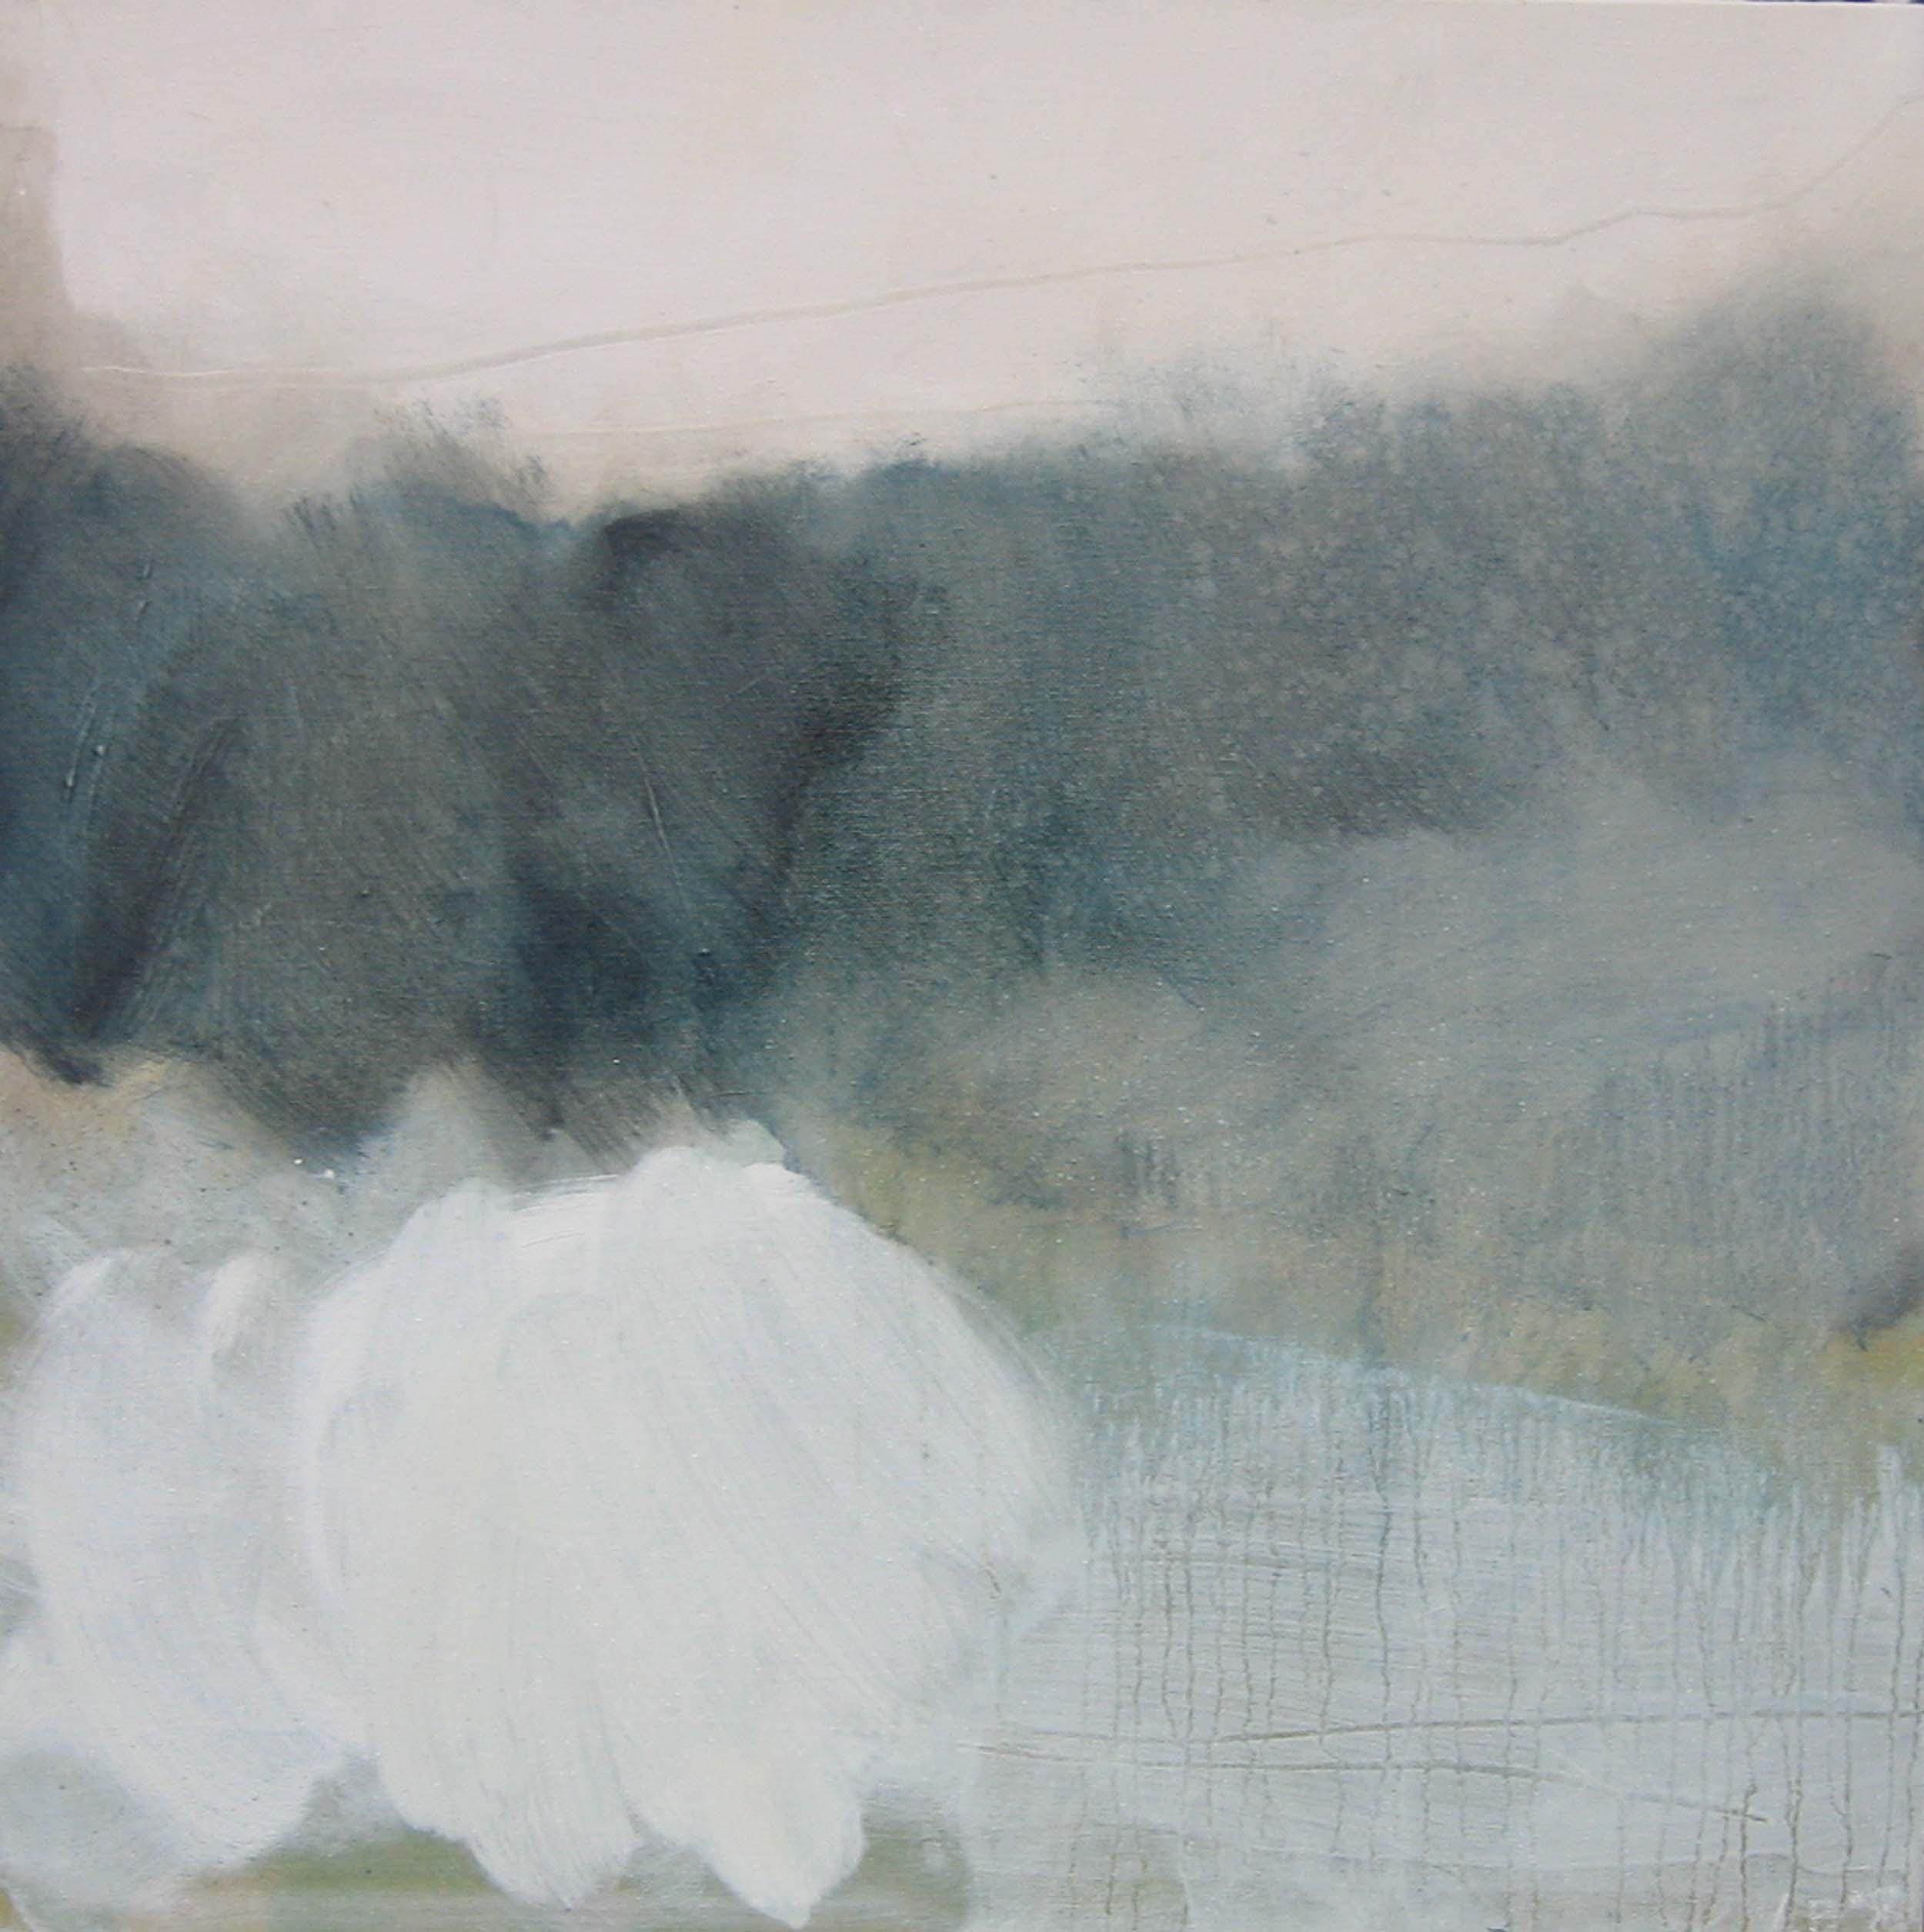 Leah Beggs 2008 - Smudged Landscape - Oil on Canvas 60 x 60 cm_sml.jpg